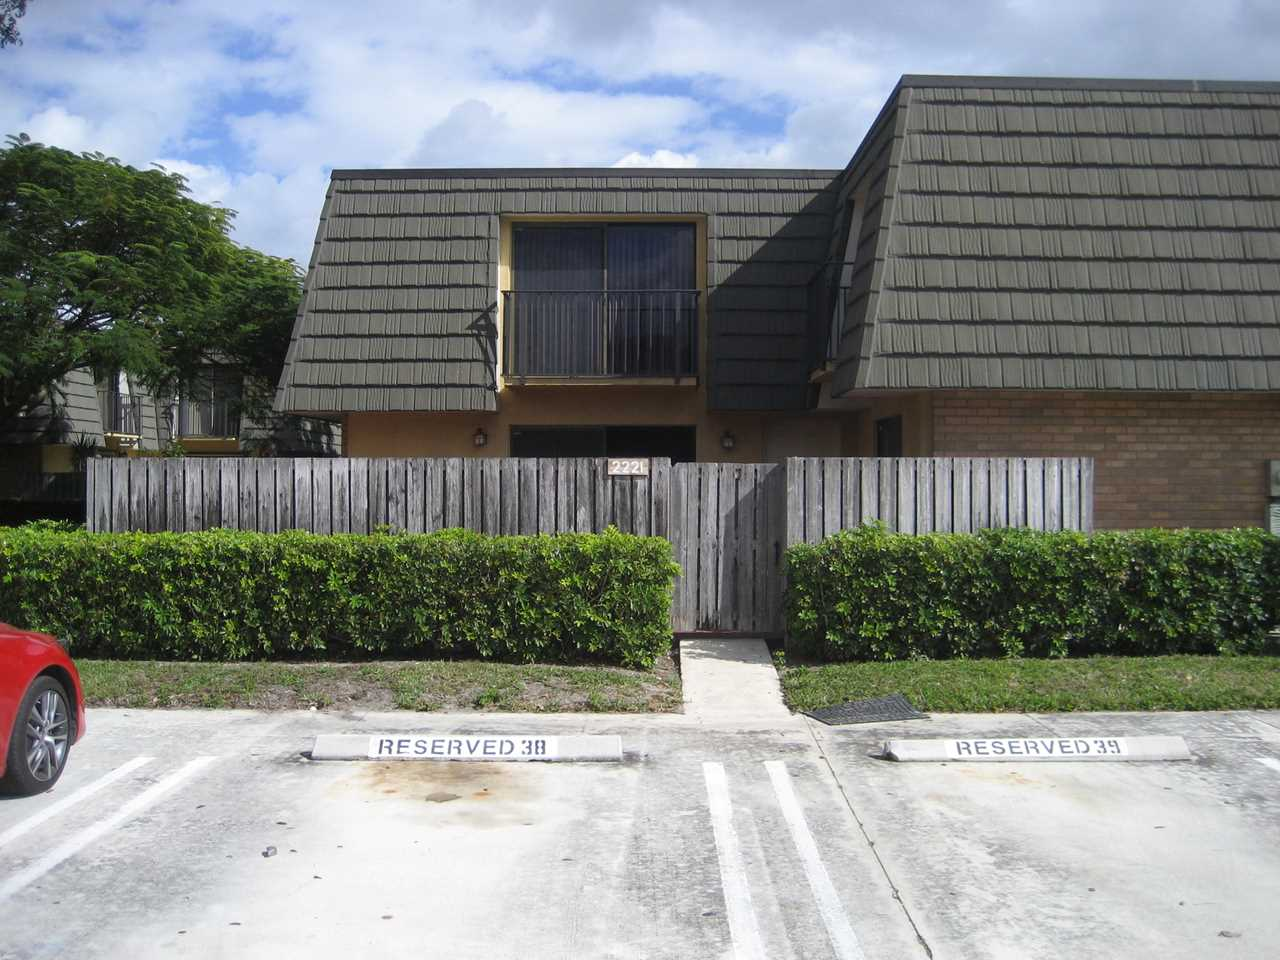 2221 22Nd Way West Palm Beach, FL 33407 | MLS RX-10494817 Photo 1